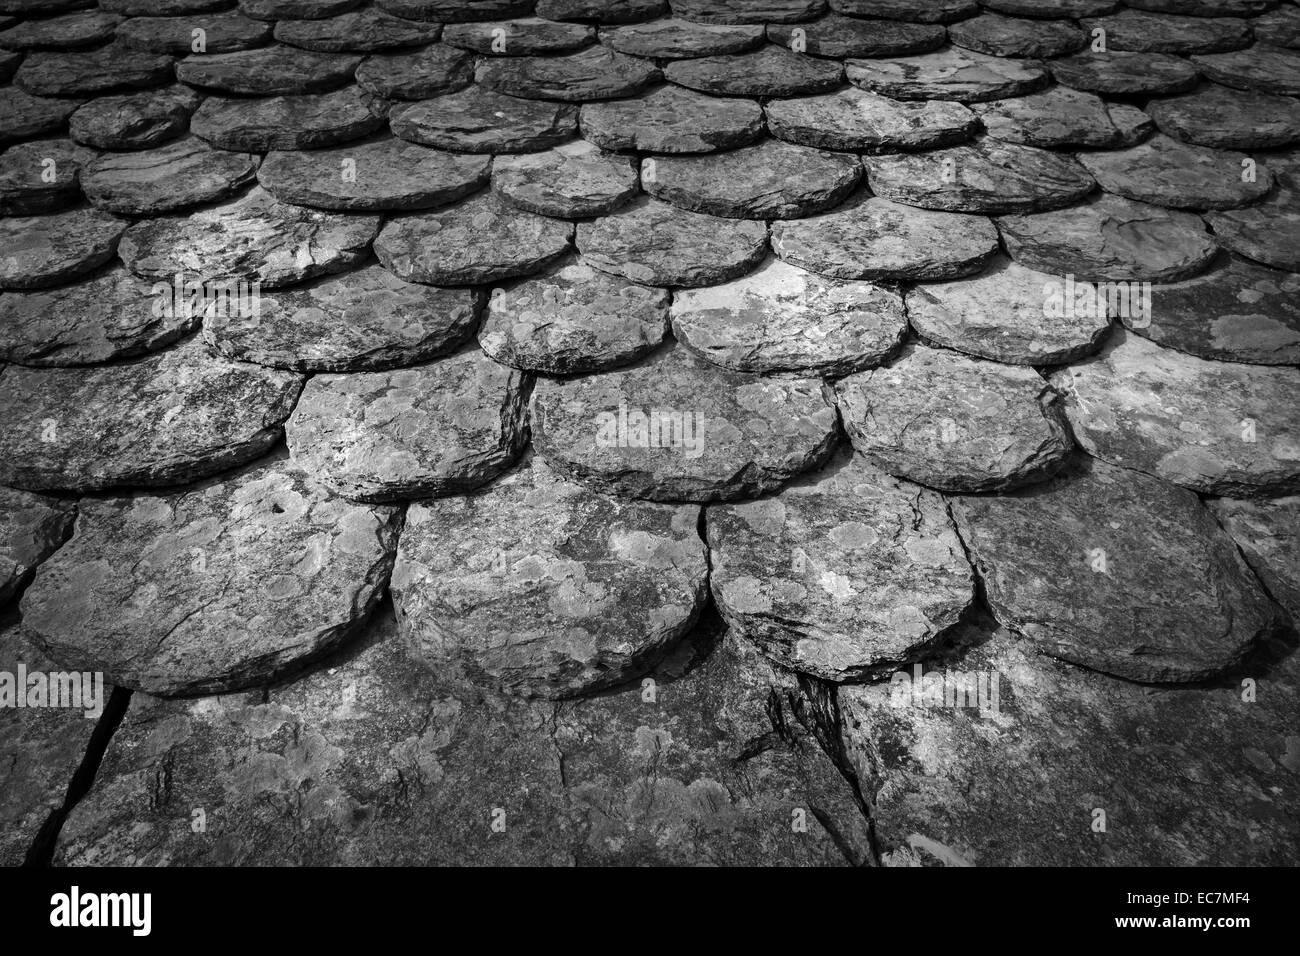 Tradicional techo de esquisto cevennes, Francia. Imagen De Stock